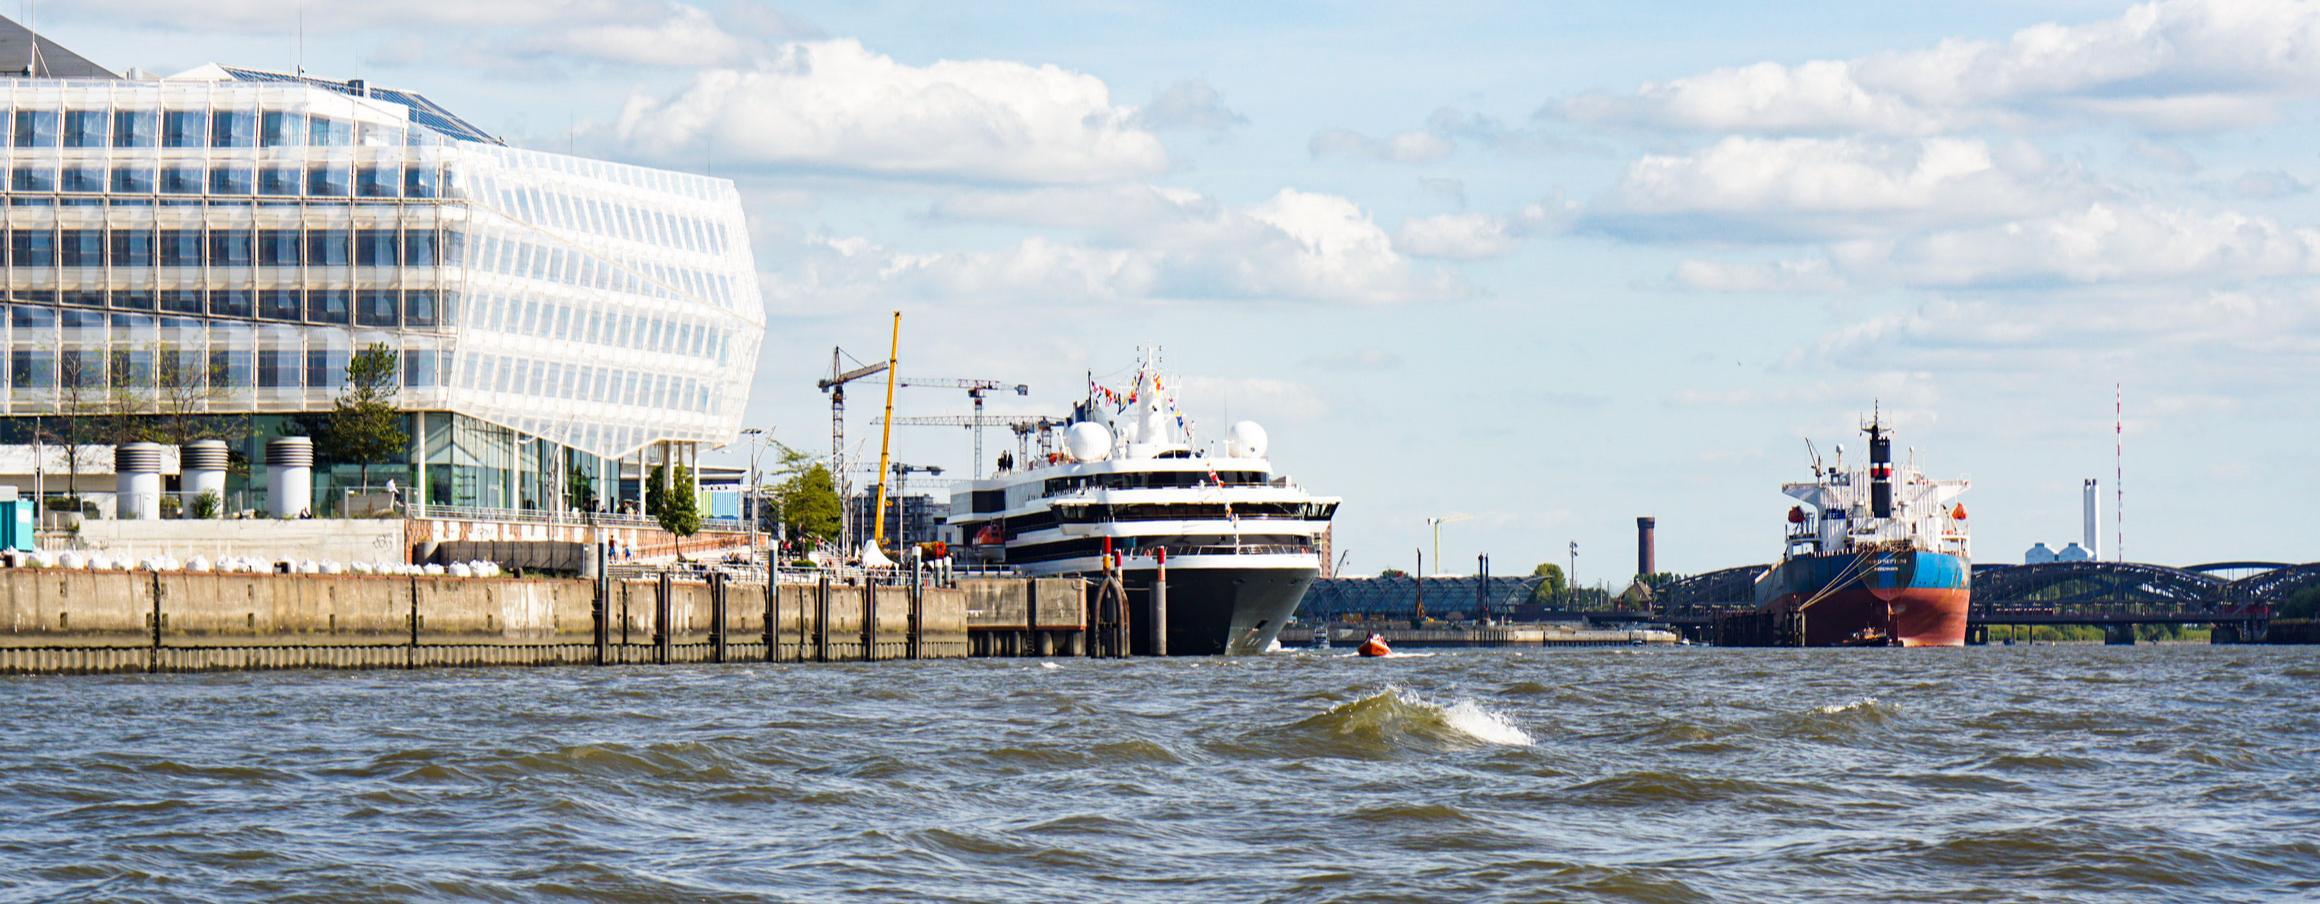 WORLD EXPLORER | Position, Webcam & Routen Cruise Paper